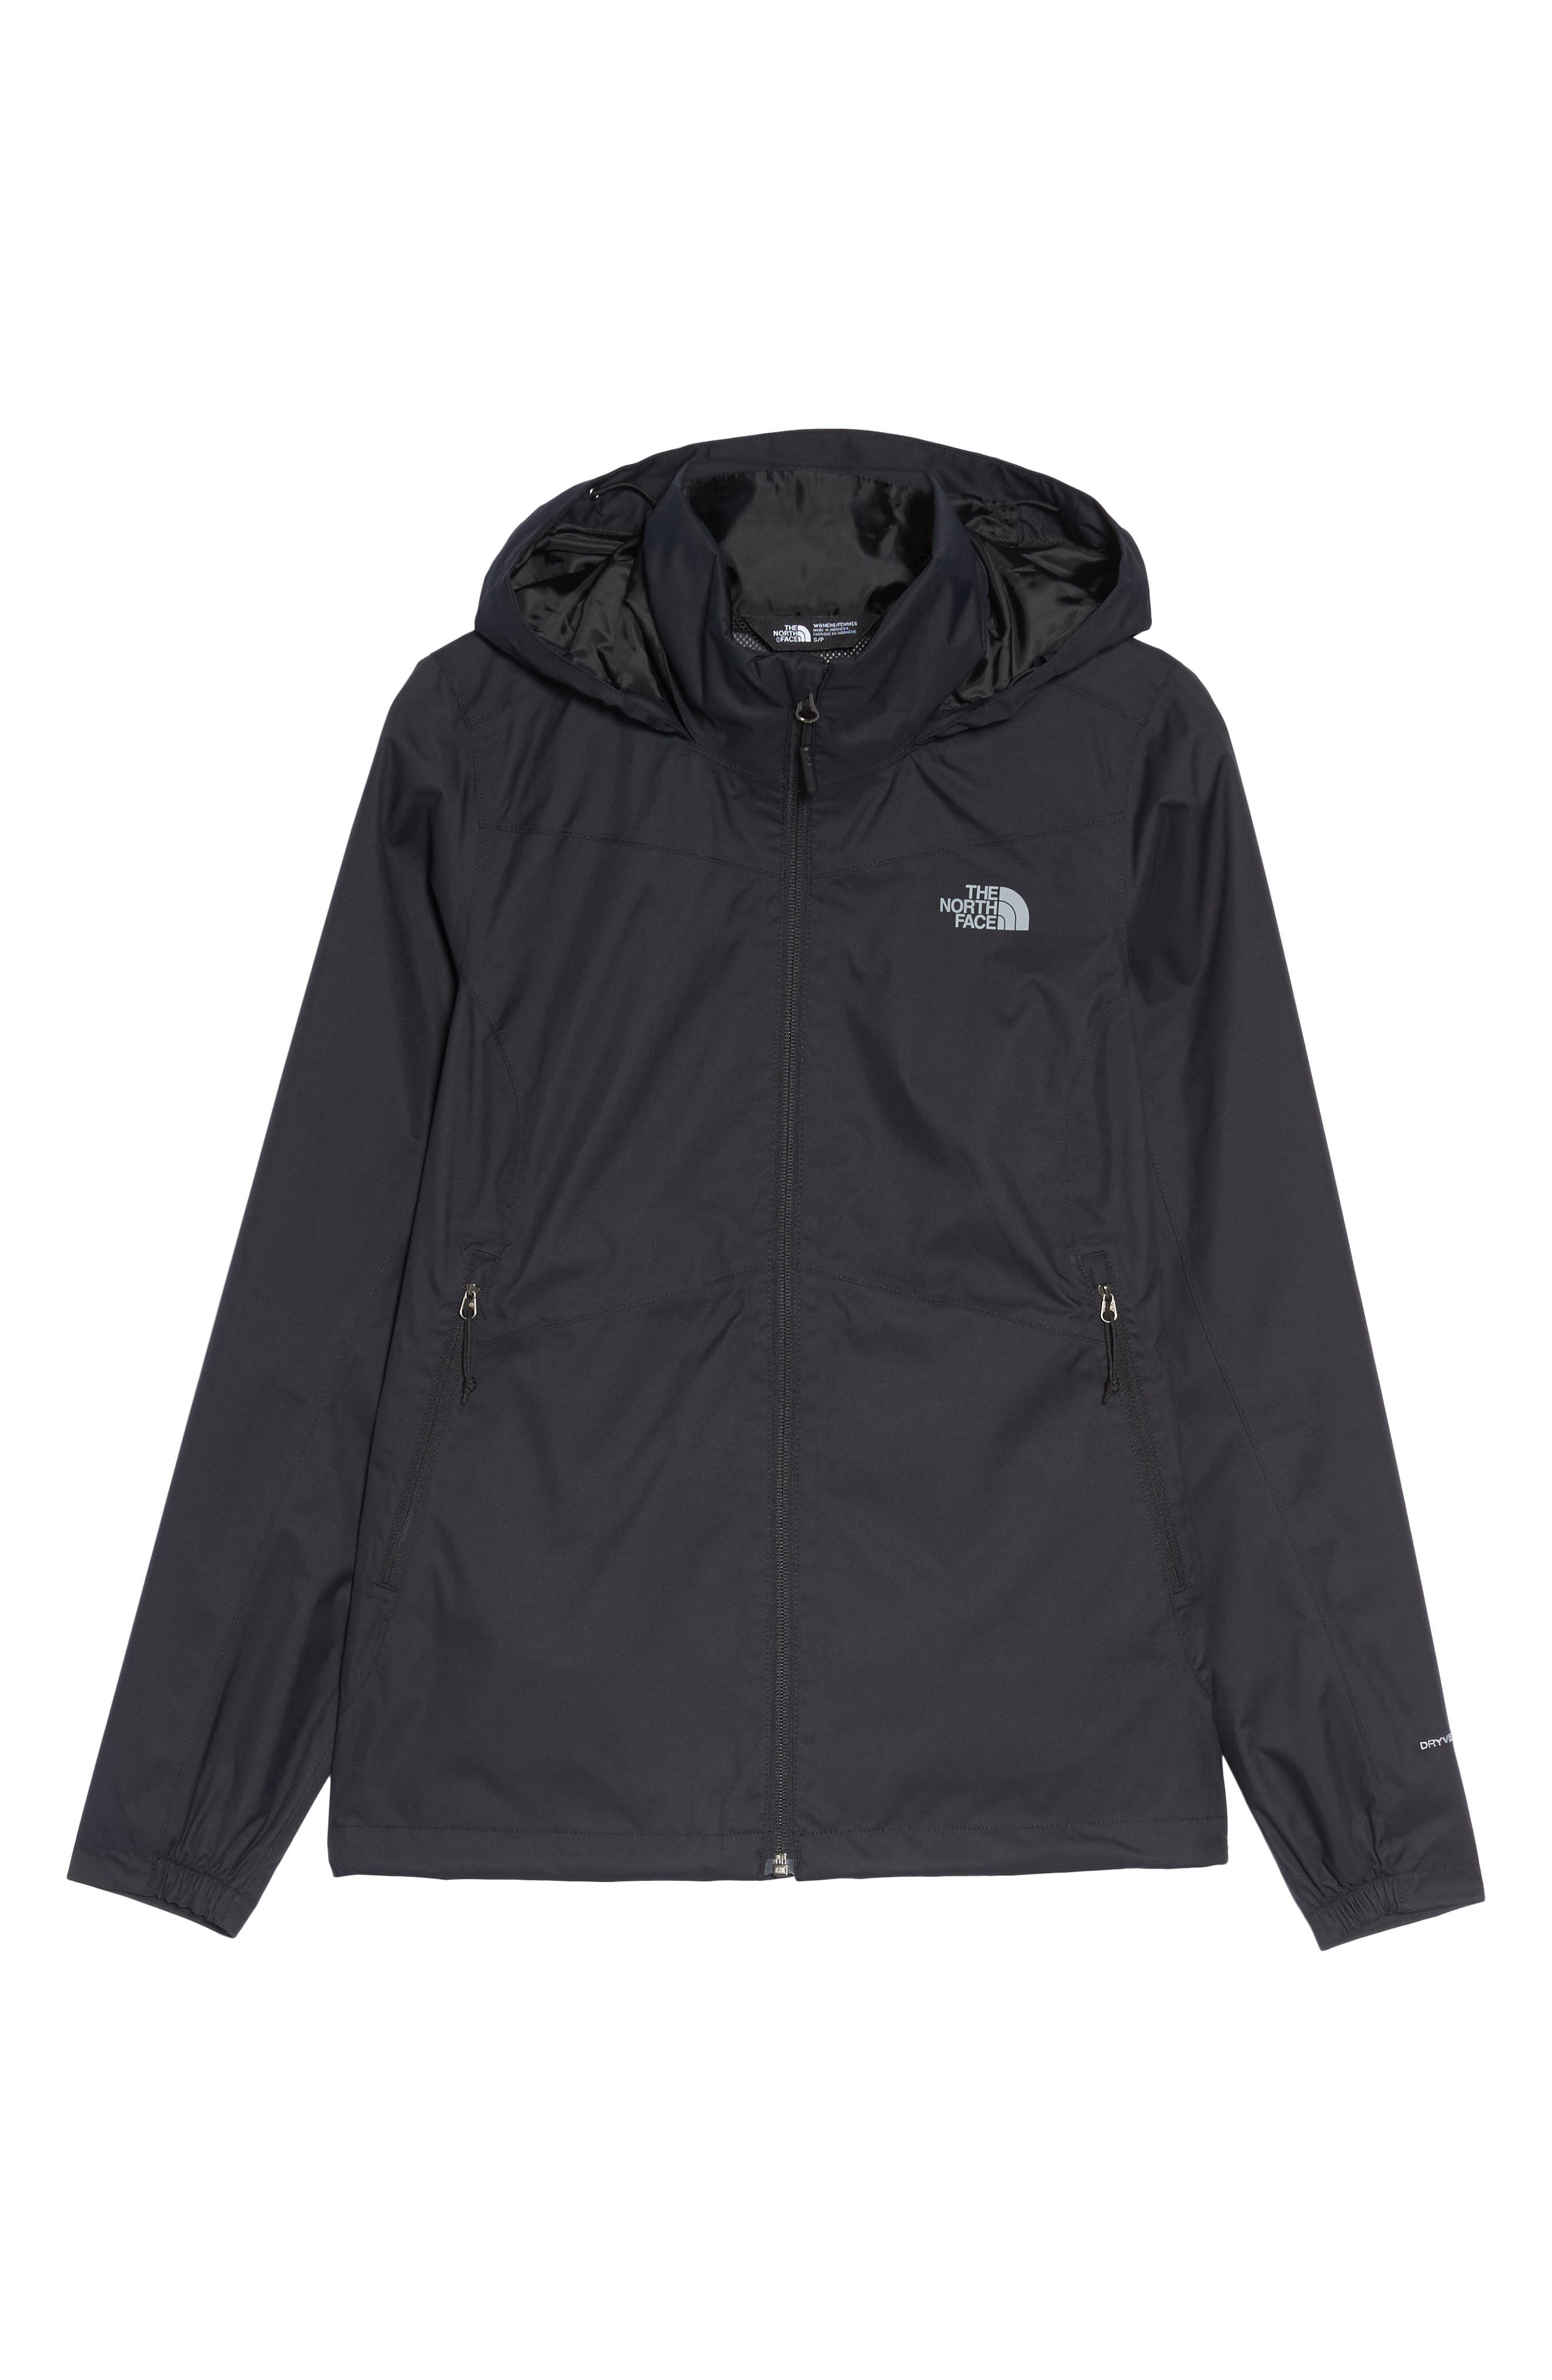 'Resolve Plus' Waterproof Jacket,                             Alternate thumbnail 7, color,                             Tnf Black